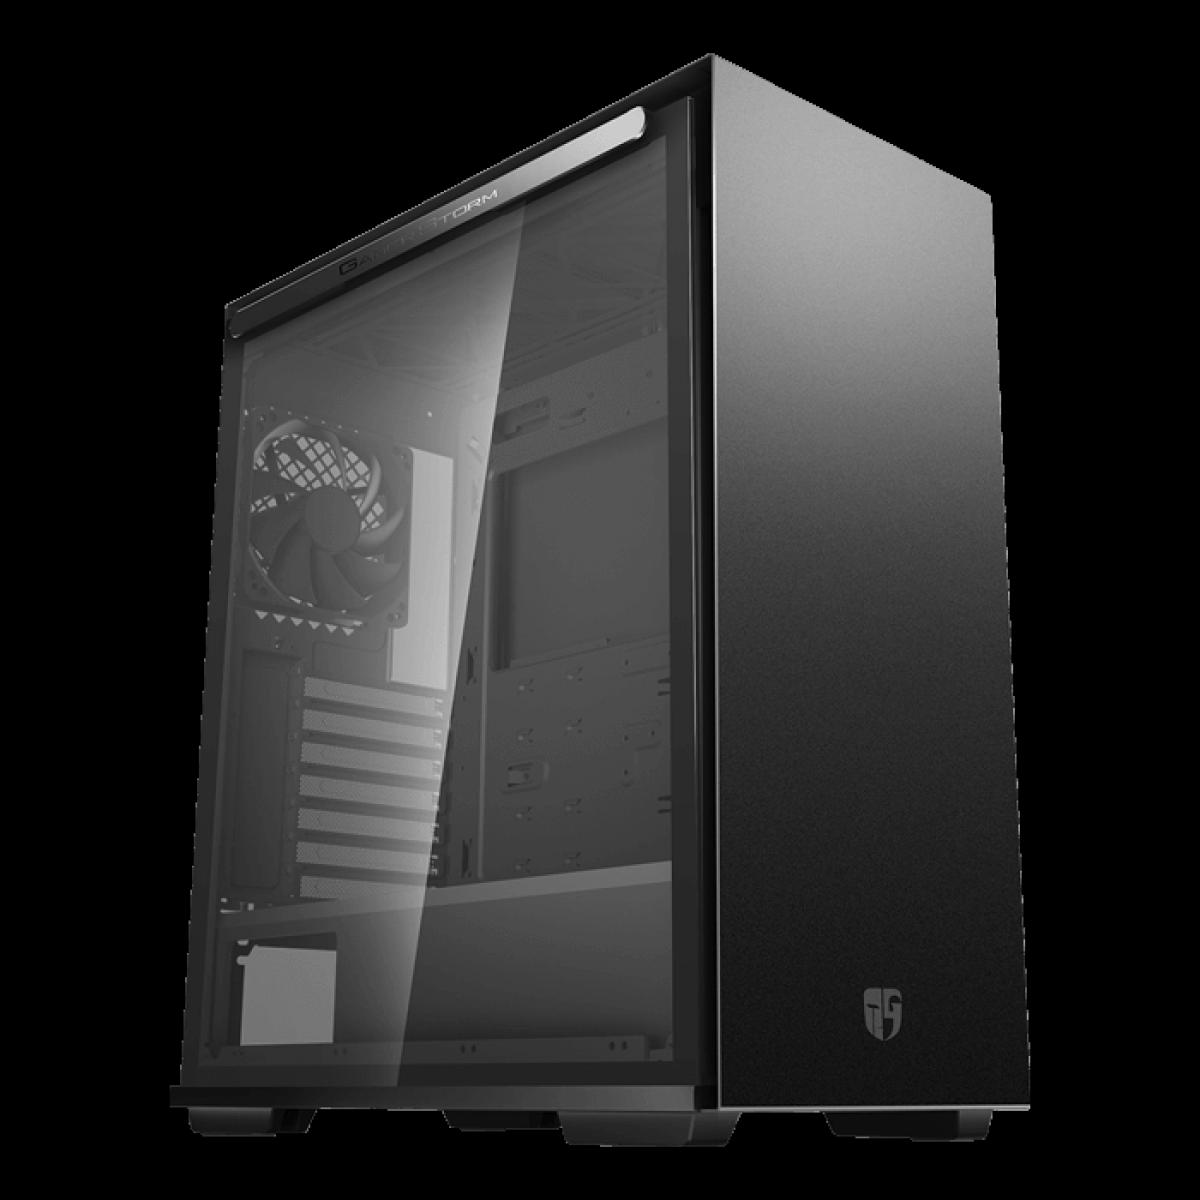 Gabinete Gamer DeepCool Macube 310, Mid Tower, Vidro Temperado, Black, Sem Fonte, Sem Fan, GS-ATX-MACUBE310-BKG0P